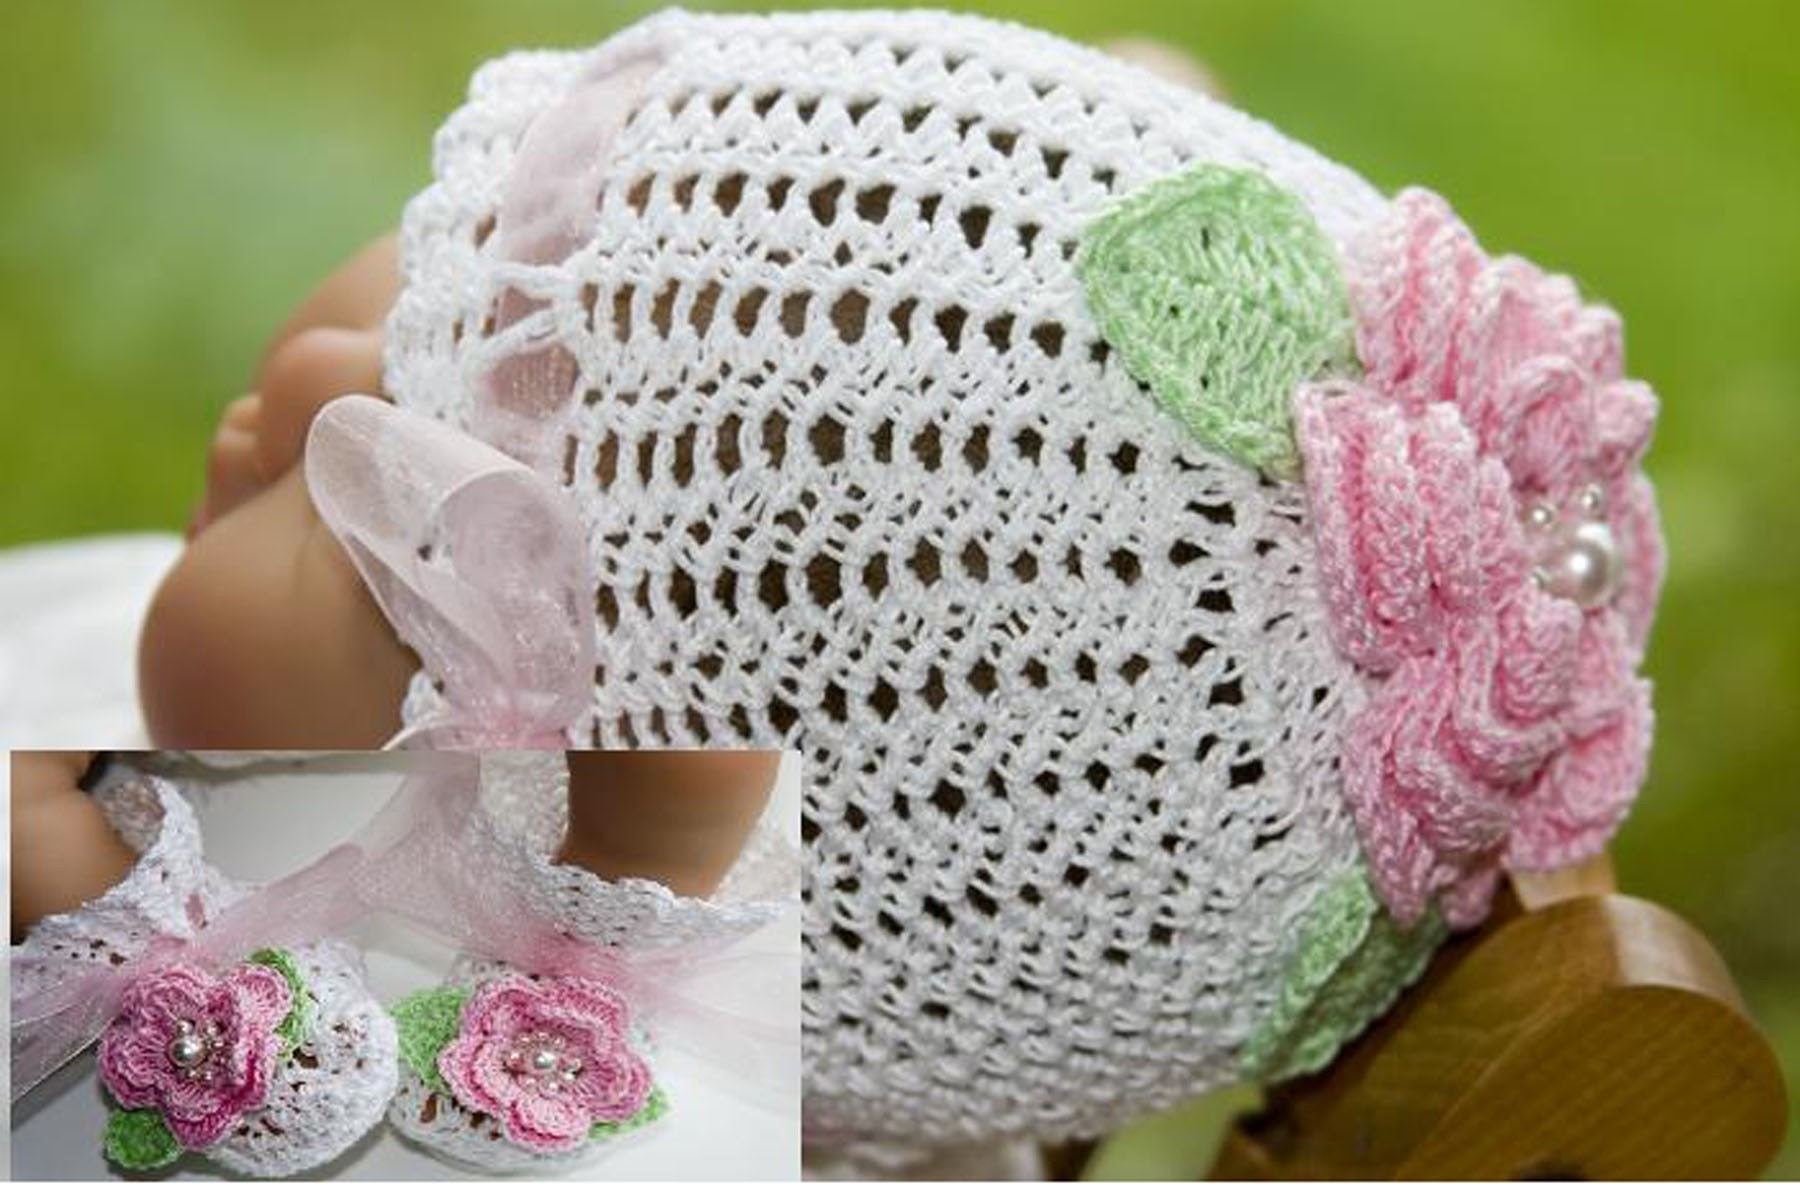 Cheryls Crochet CC36 Victorian Rose Baby Bootie and Bonnet